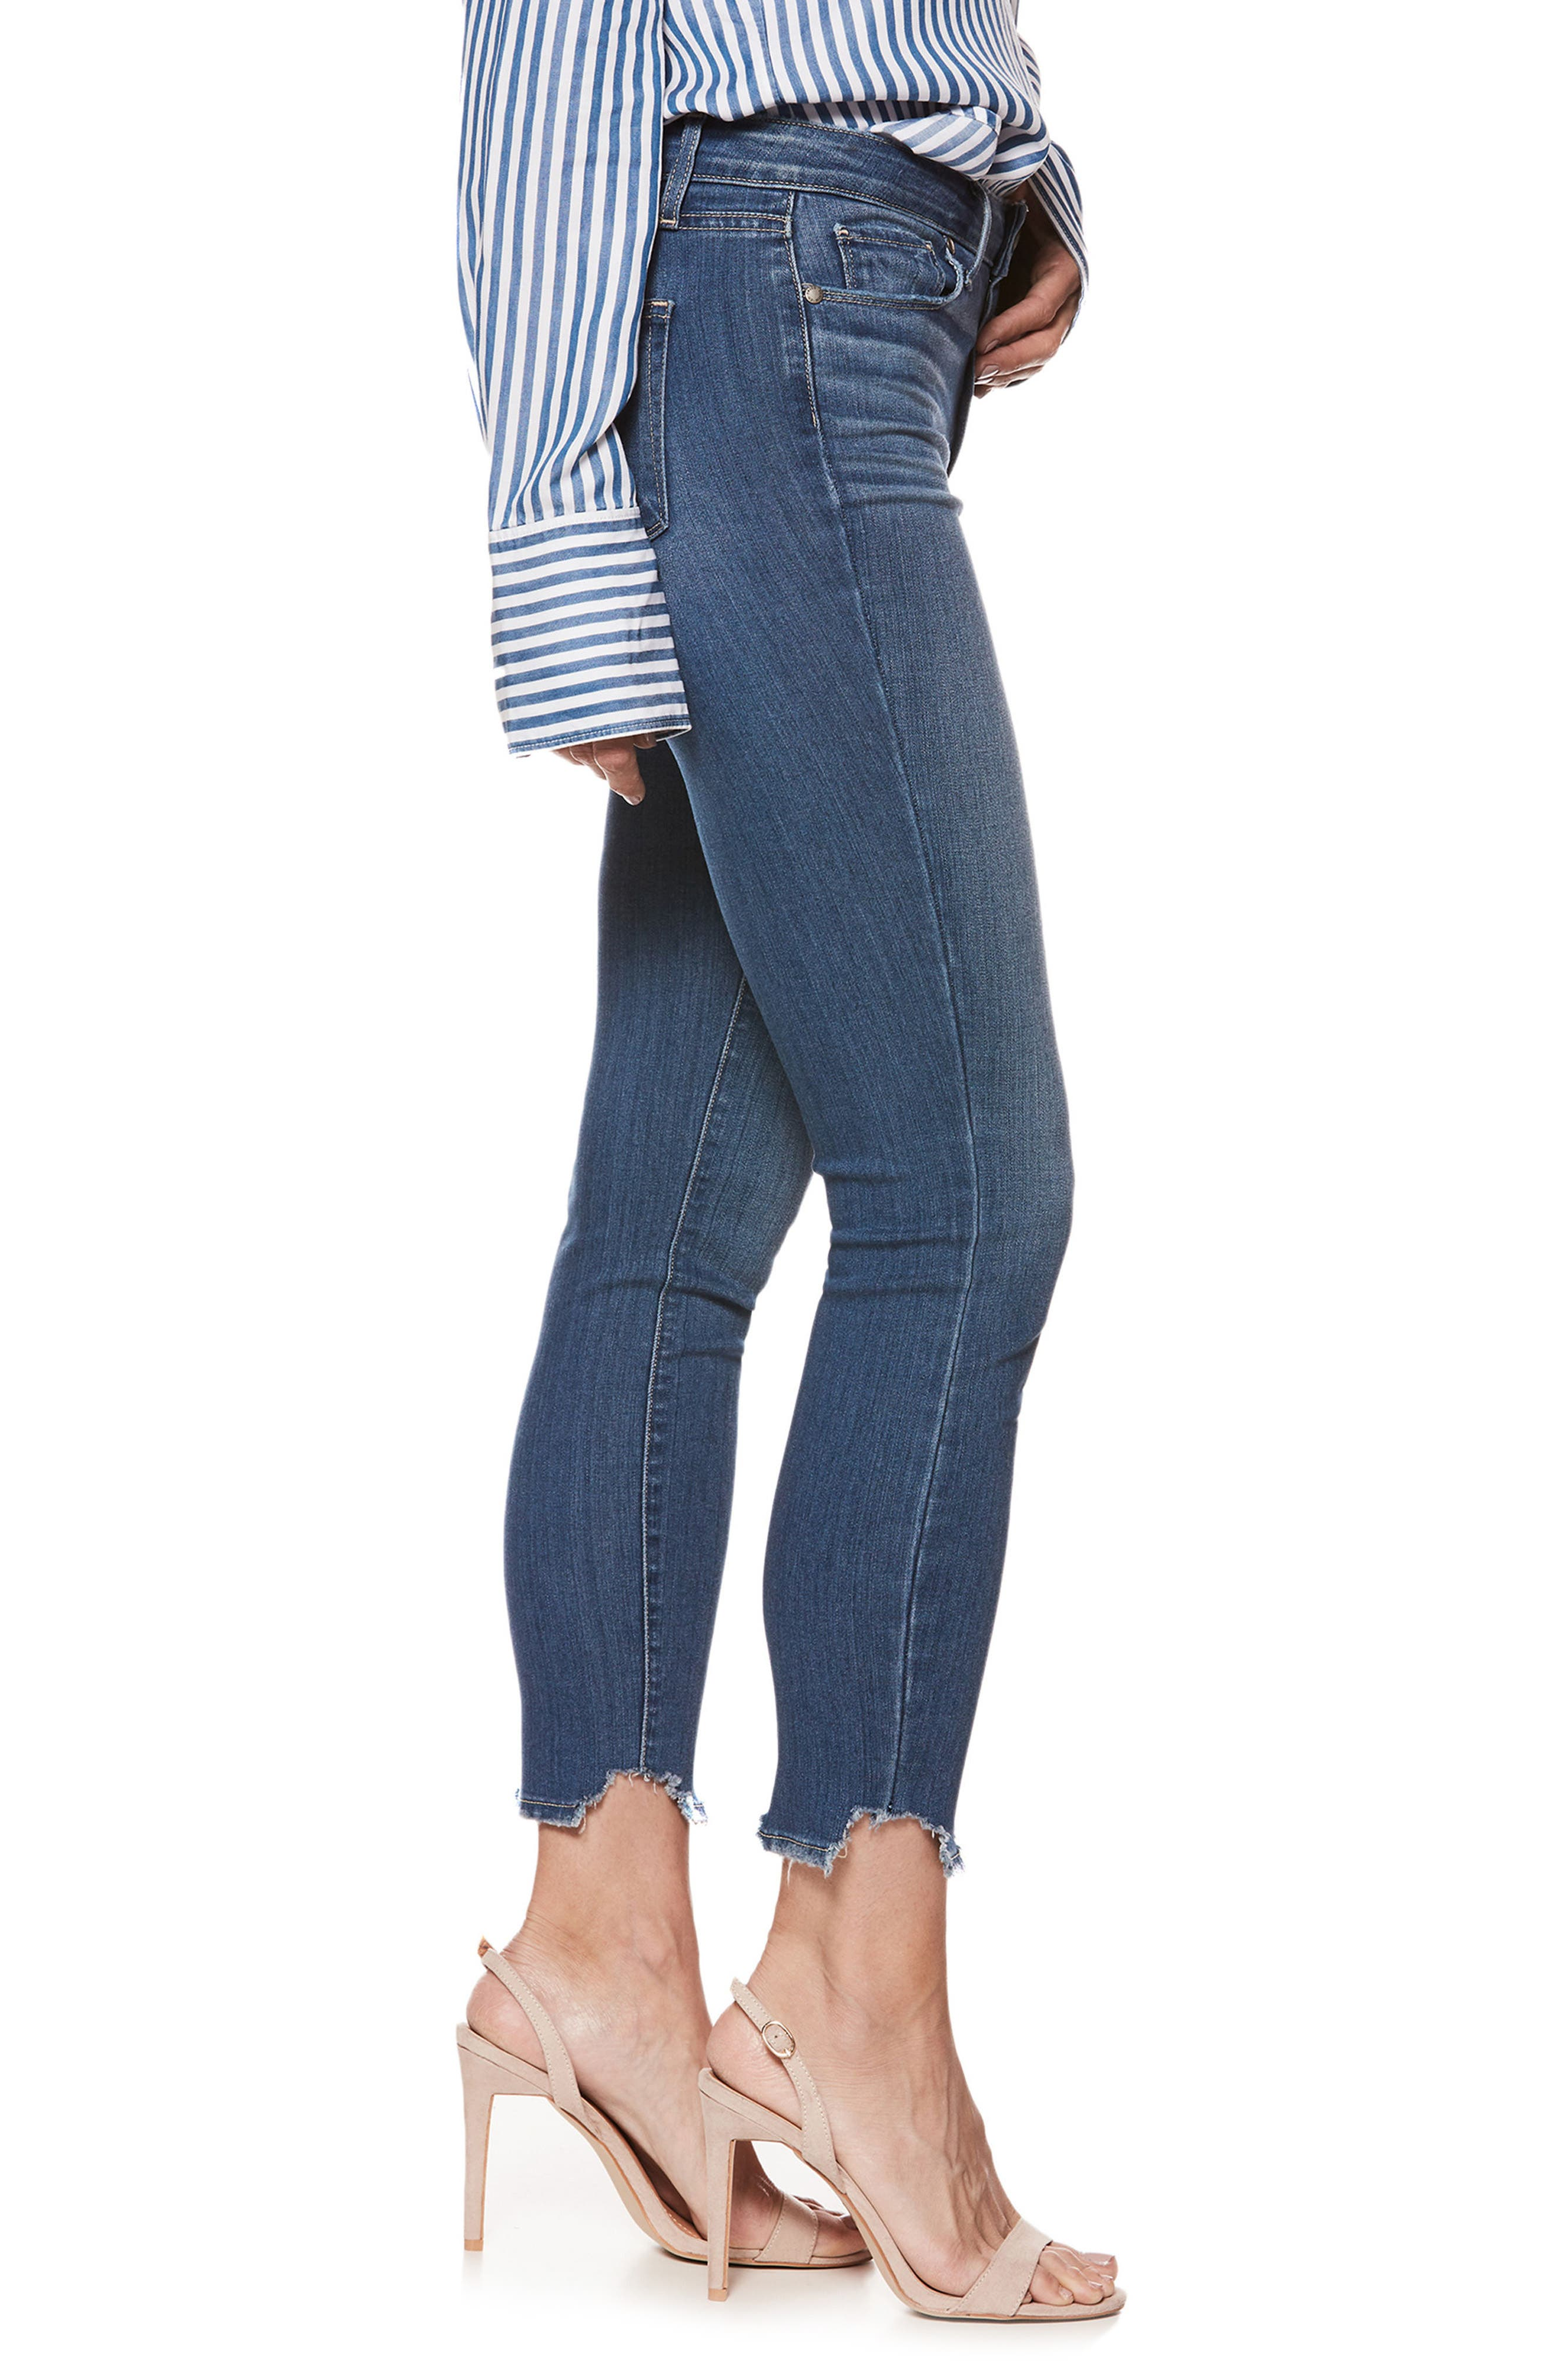 Transcend - Hoxton High Waist Crop Skinny Jeans,                             Alternate thumbnail 3, color,                             400